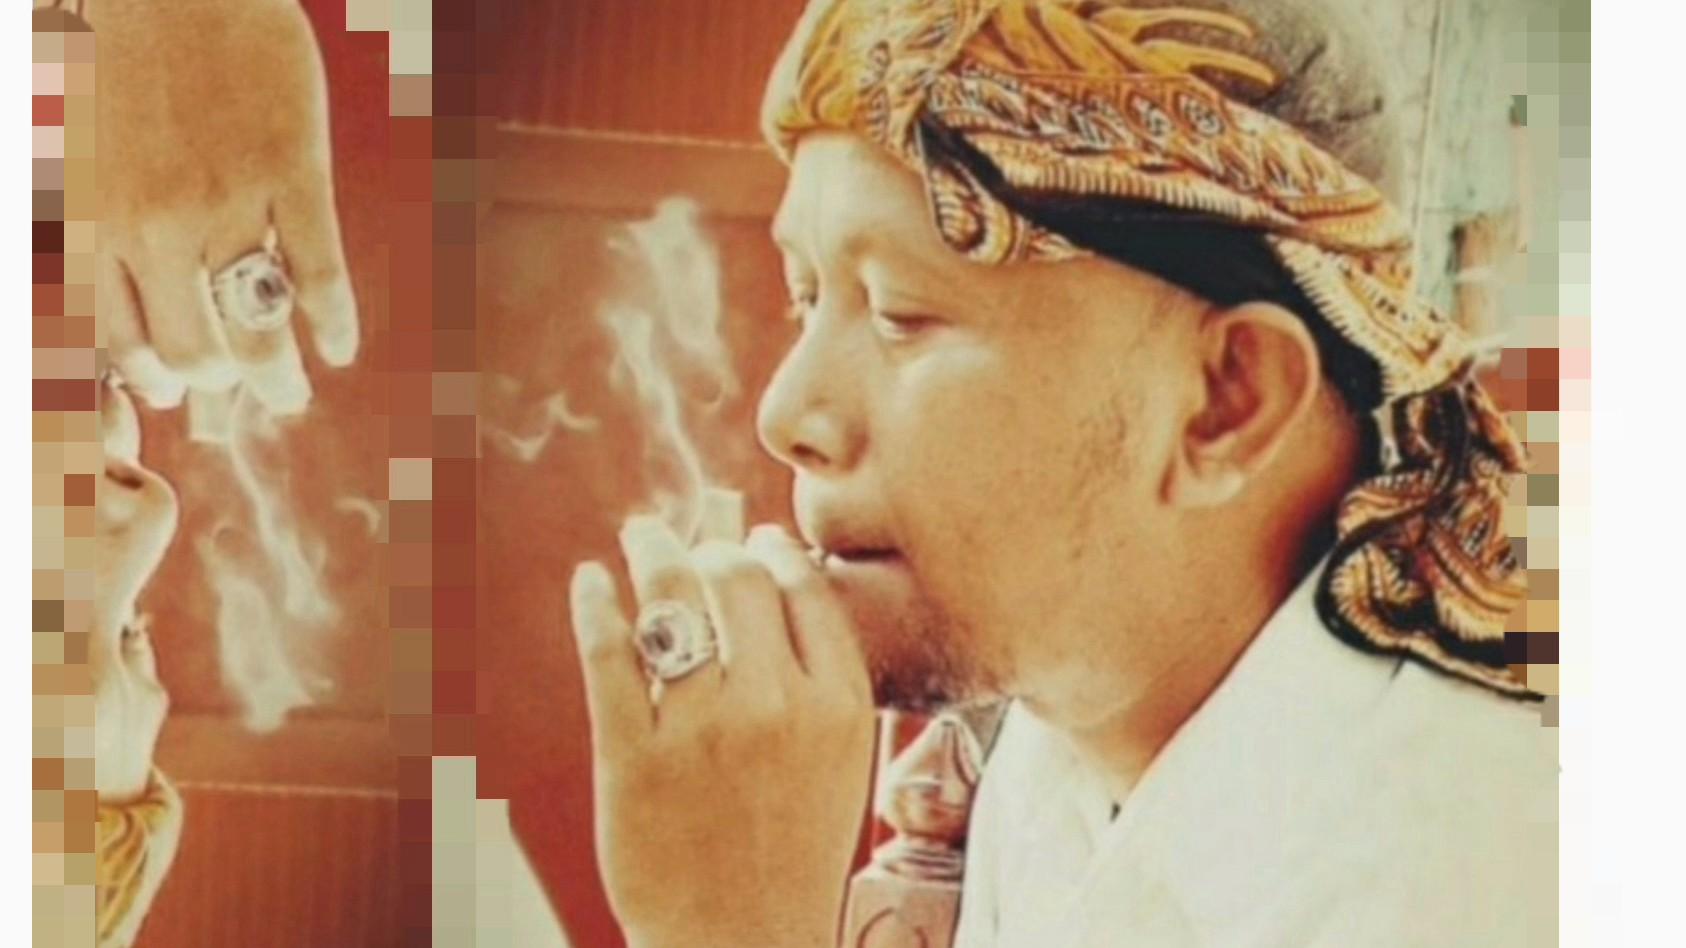 Aktivis Cagar Budaya Situbondo Peringatkan Para Penggali ODCB Ilegal